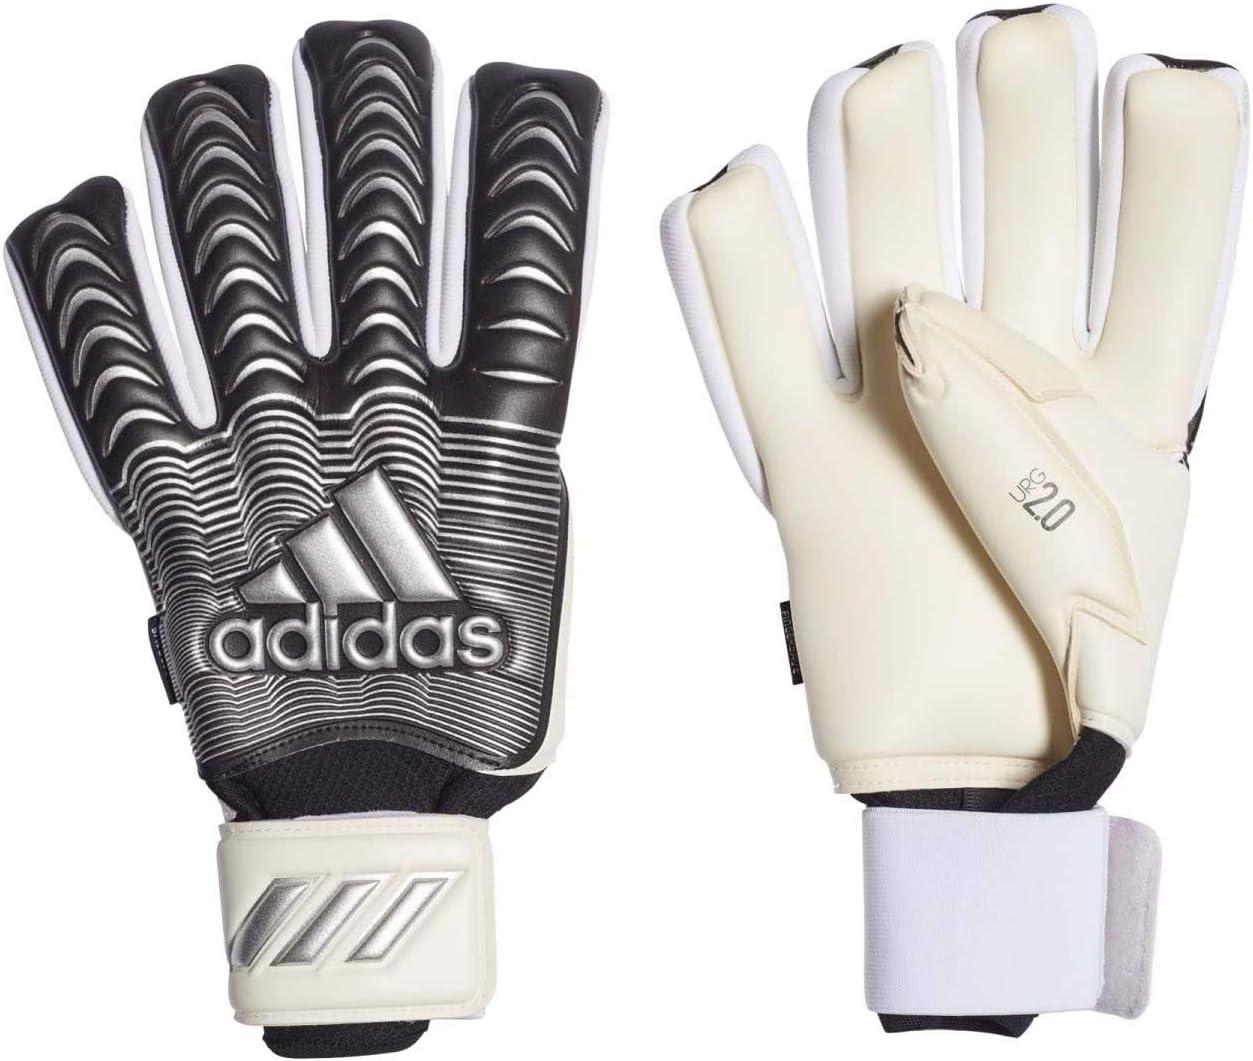 Amazon.com : adidas Classic PRO FINGERSAVE Goalkeeper Gloves ...